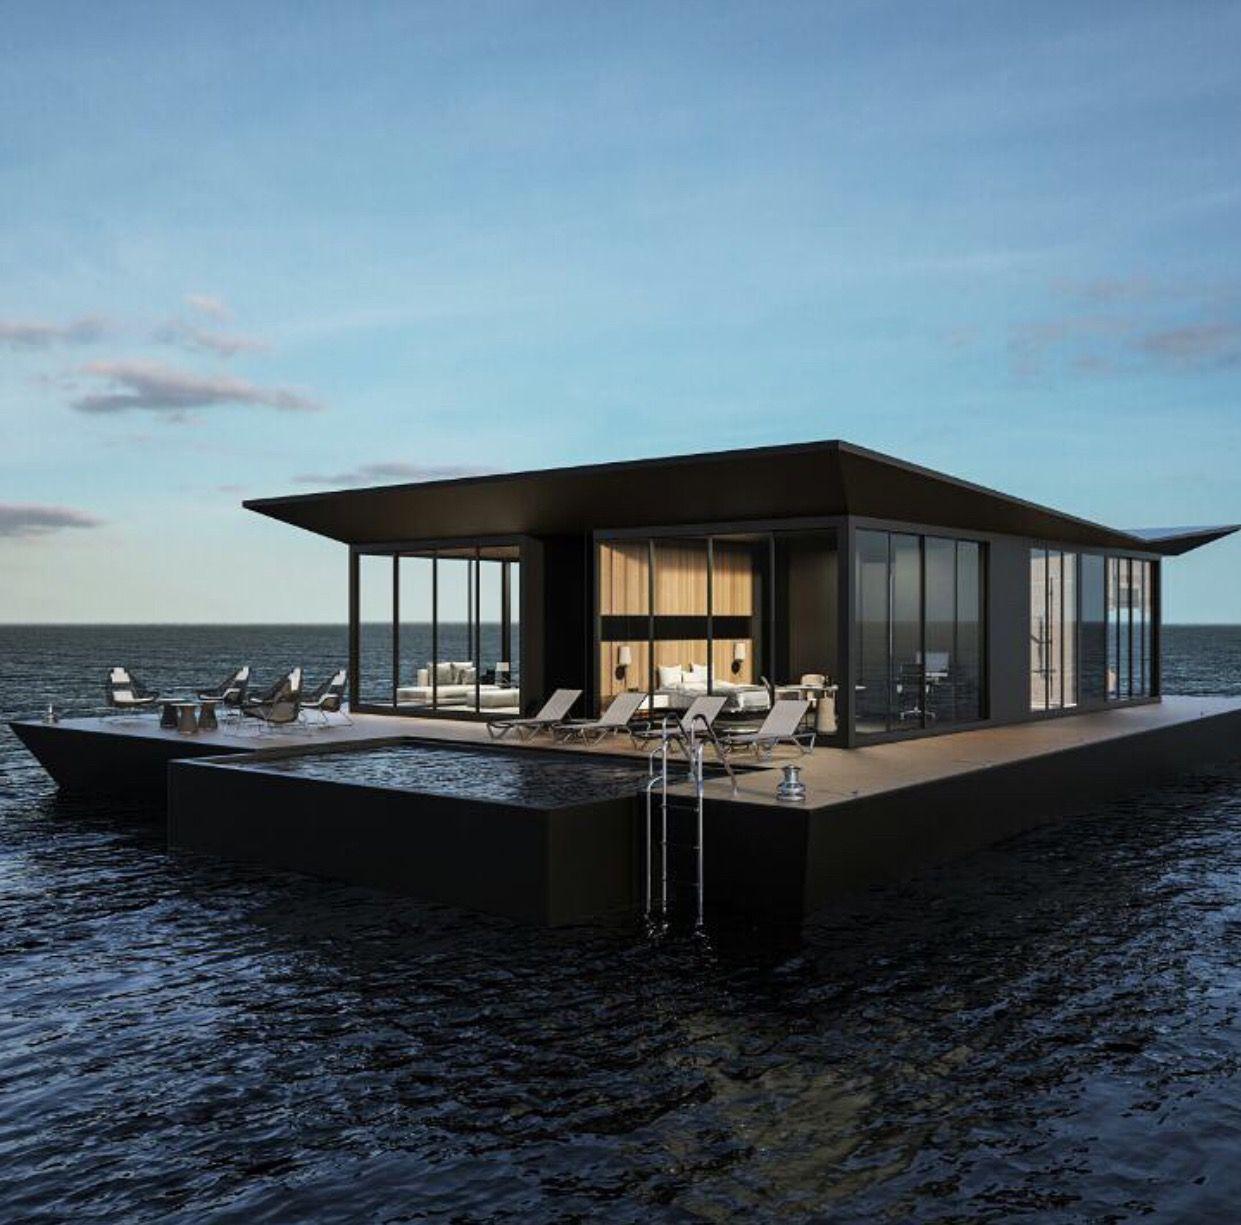 House Boat Home Design Floating